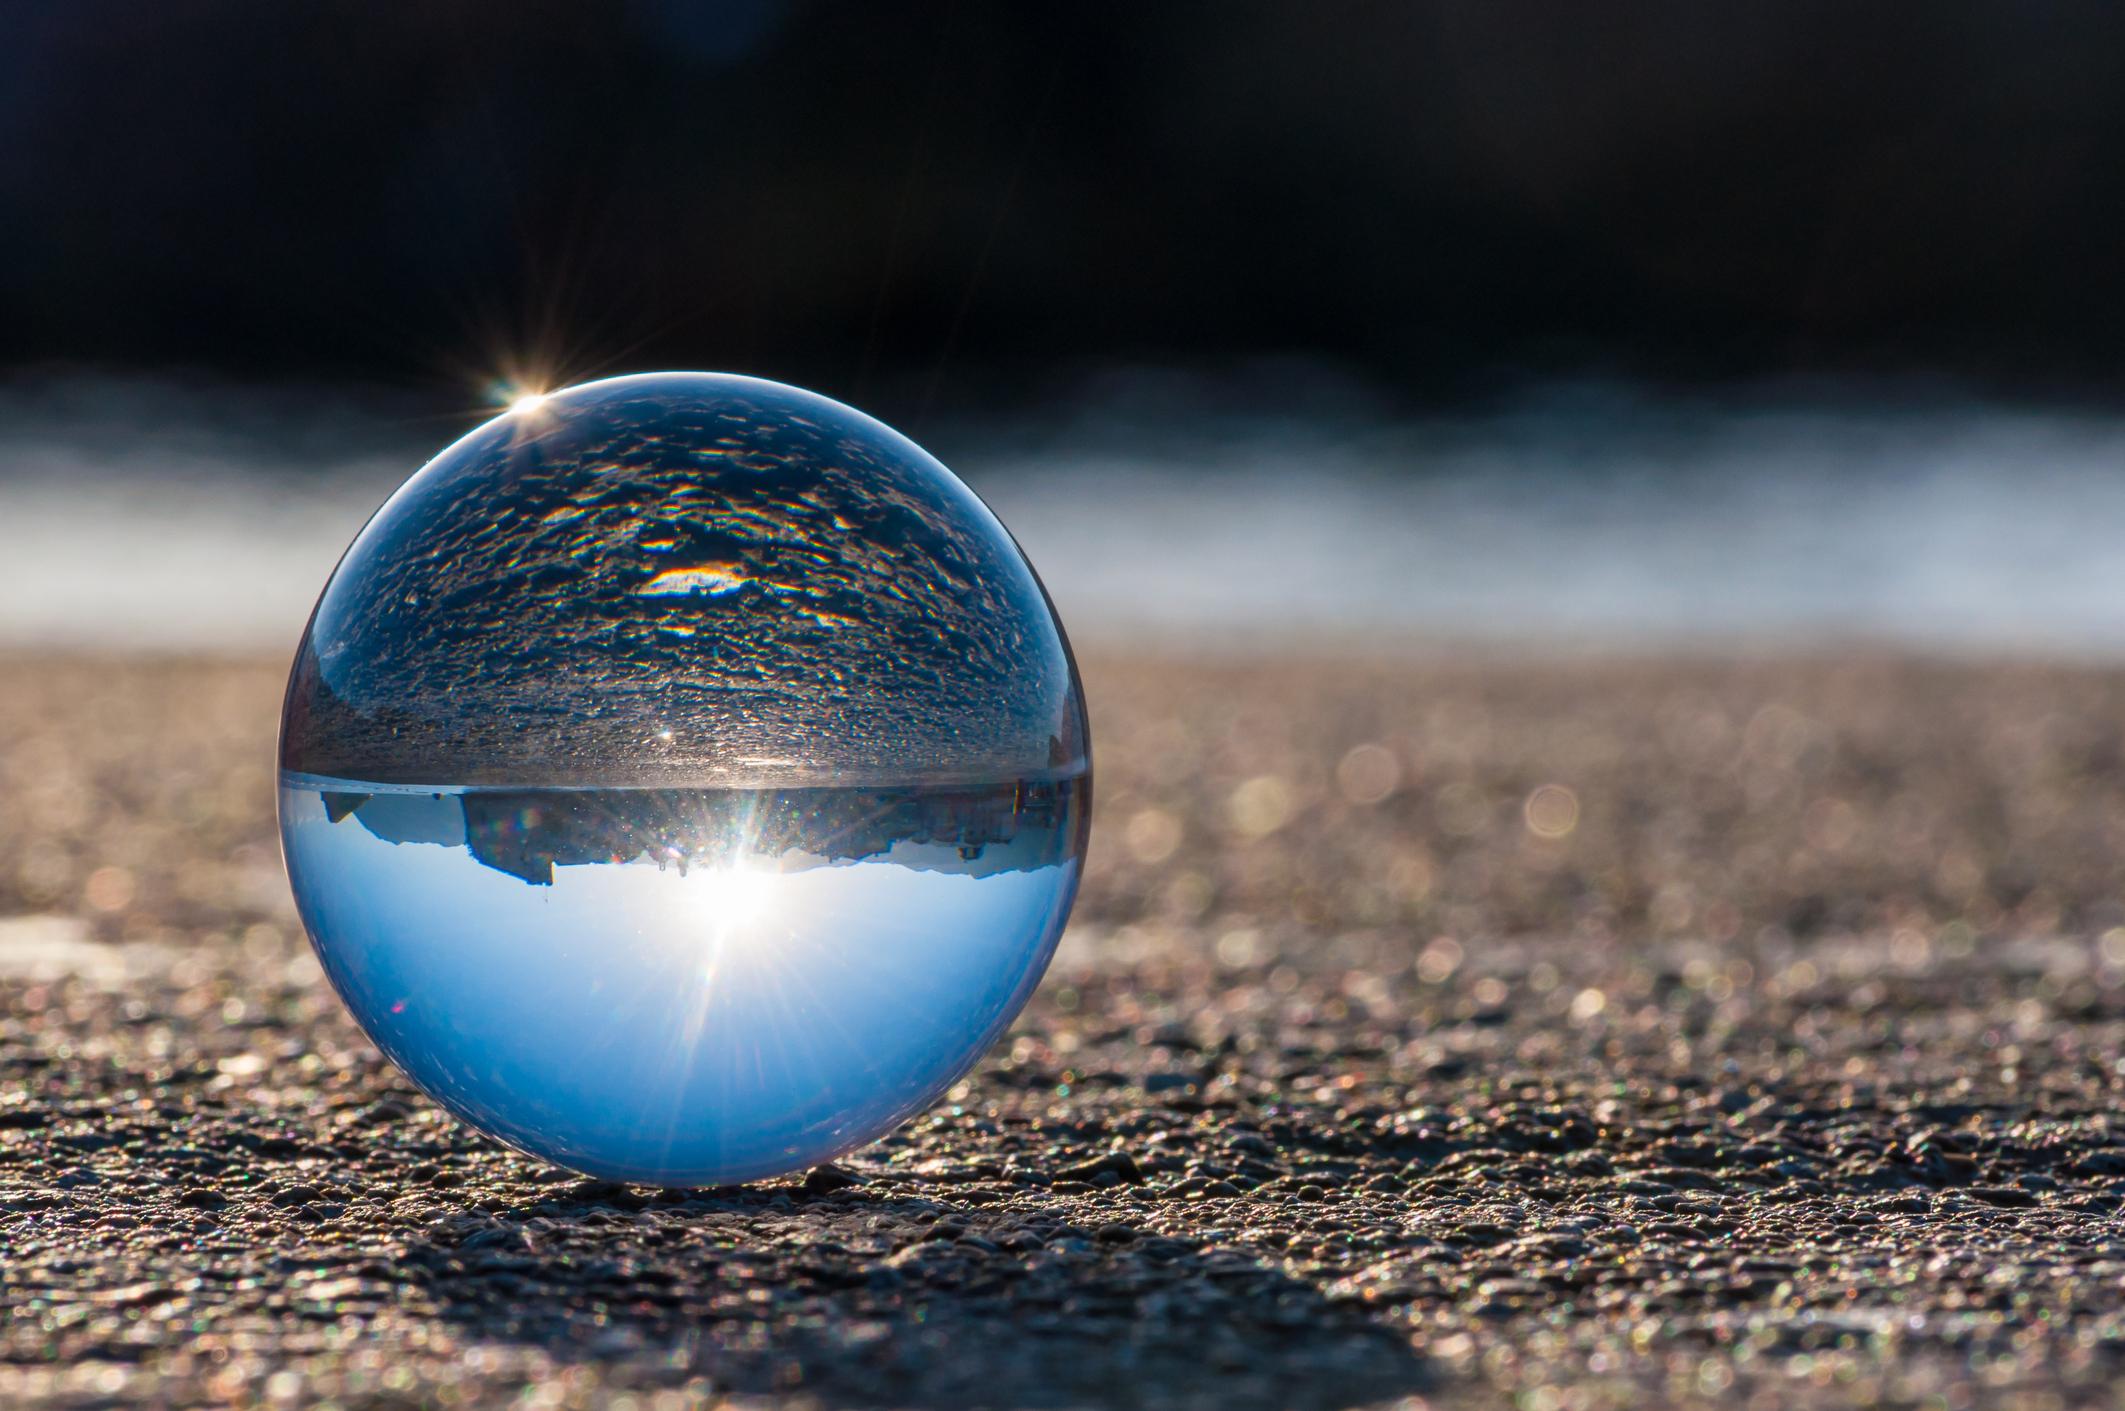 water drop reflection.jpg